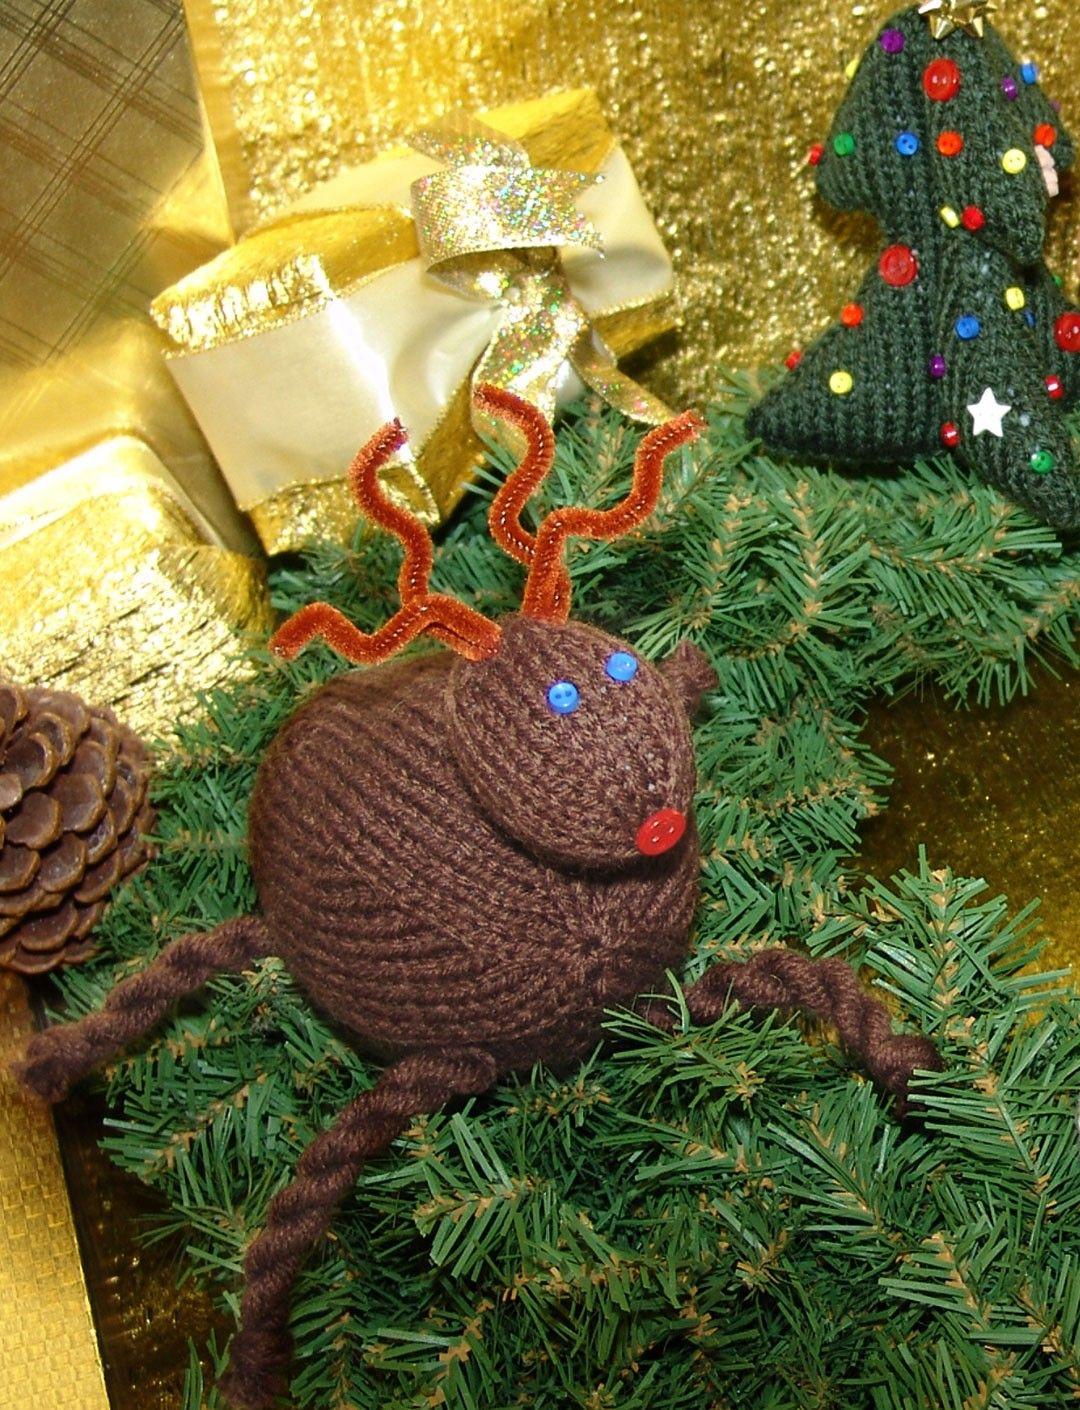 Christmas ornaments patterns yarnspirations crochet for christmas ornaments patterns yarnspirations bankloansurffo Choice Image